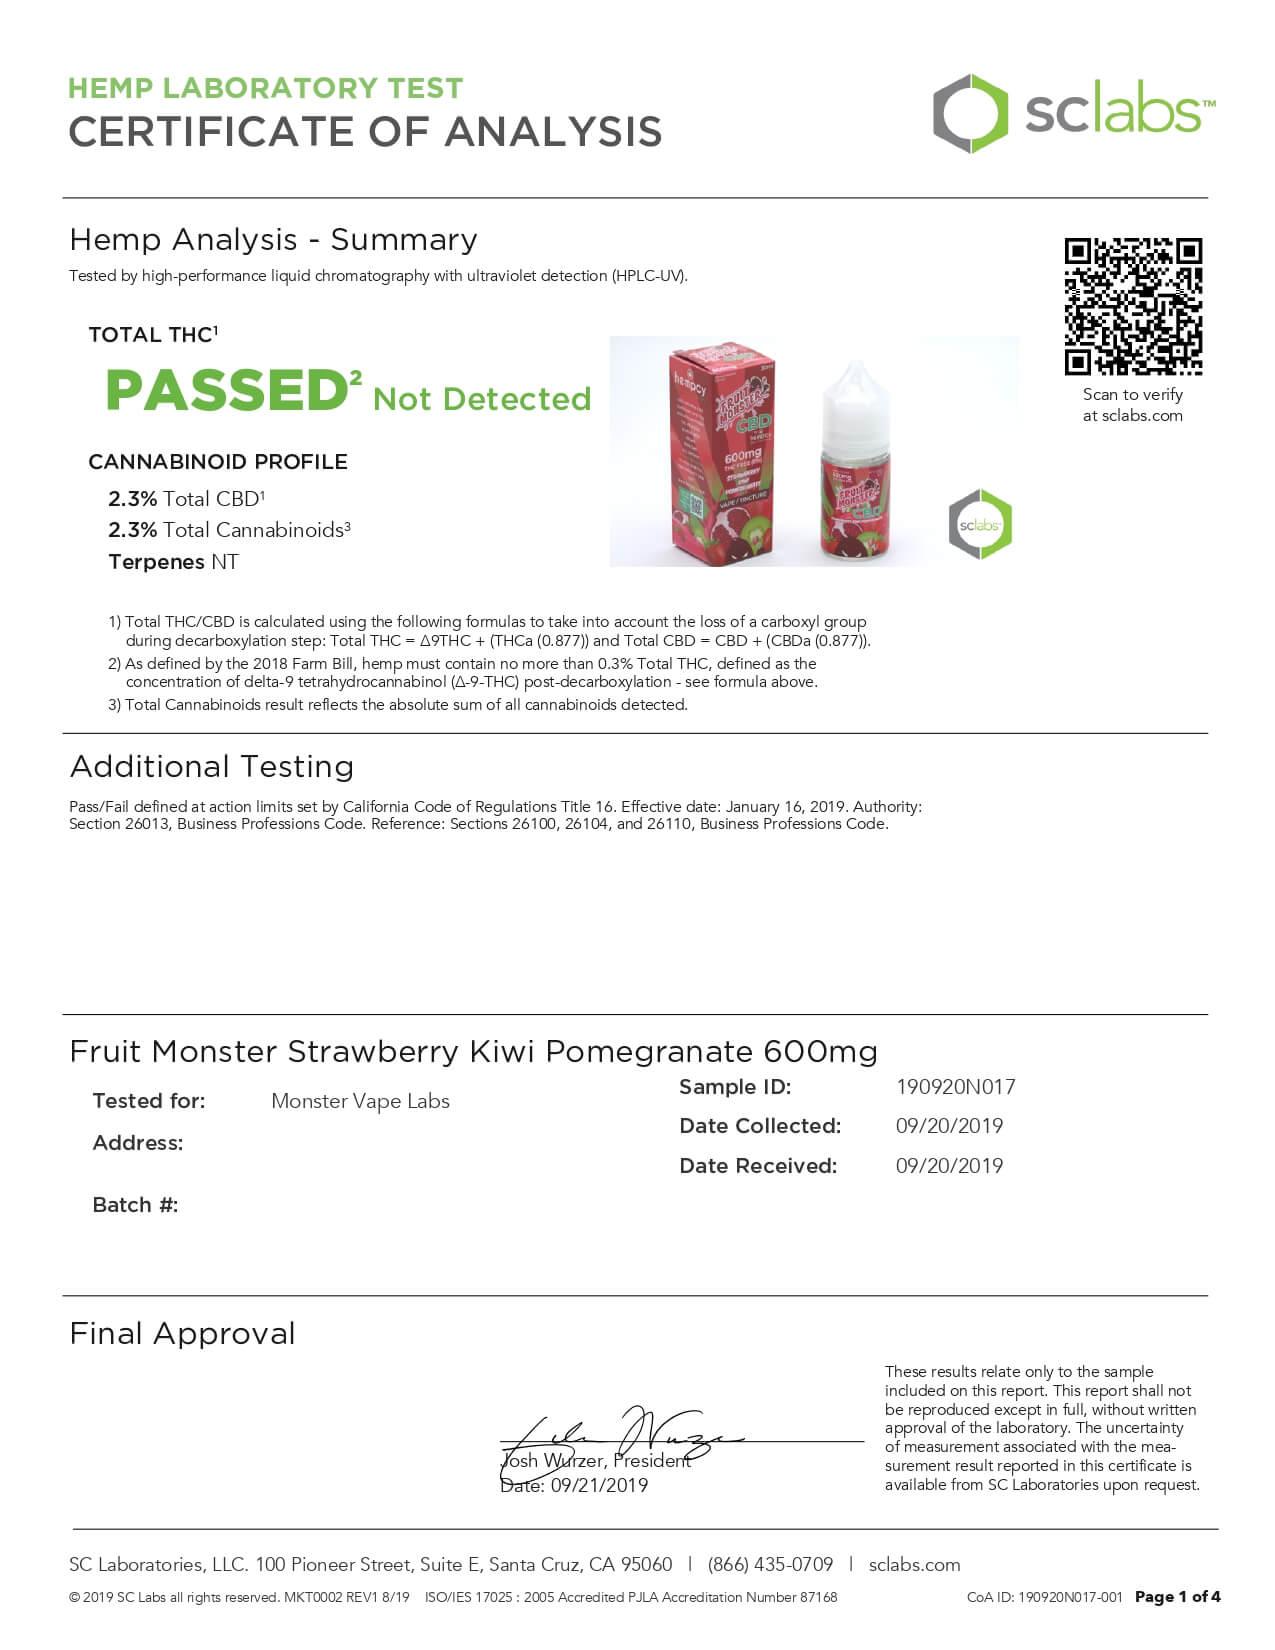 Fruit Monster CBD Vape Strawberry Kiwi Pomegranate 600mg Lab Report